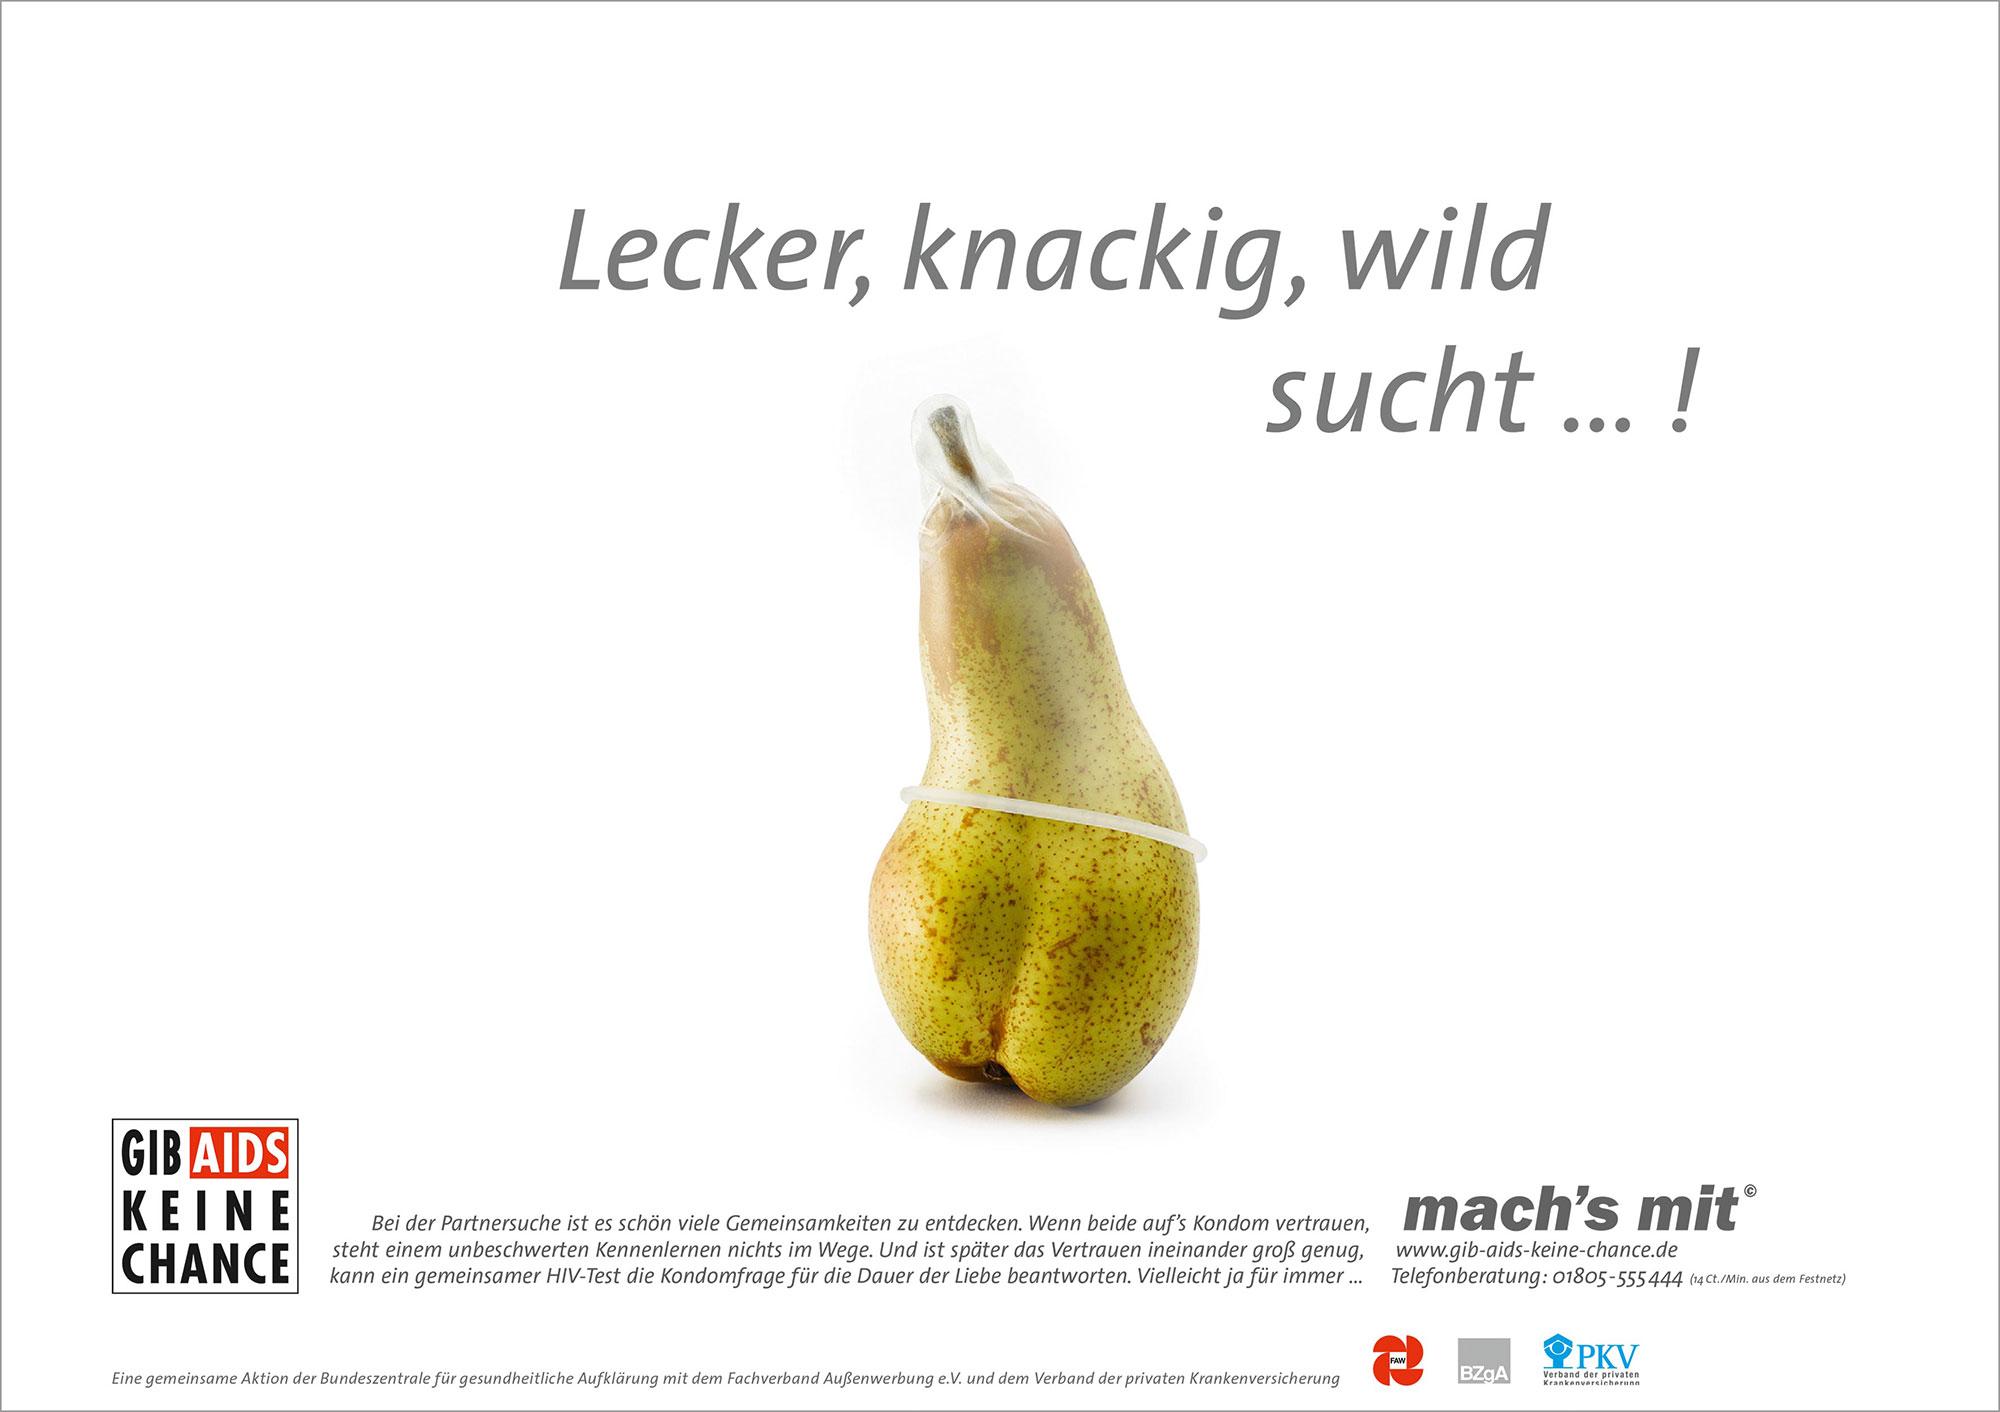 Advertising Still life Photographie Fotografie Studio BZGA mach´s mit AIDS Kampagne Birne Lecker knackig wild Kondom Idris Kolodziej